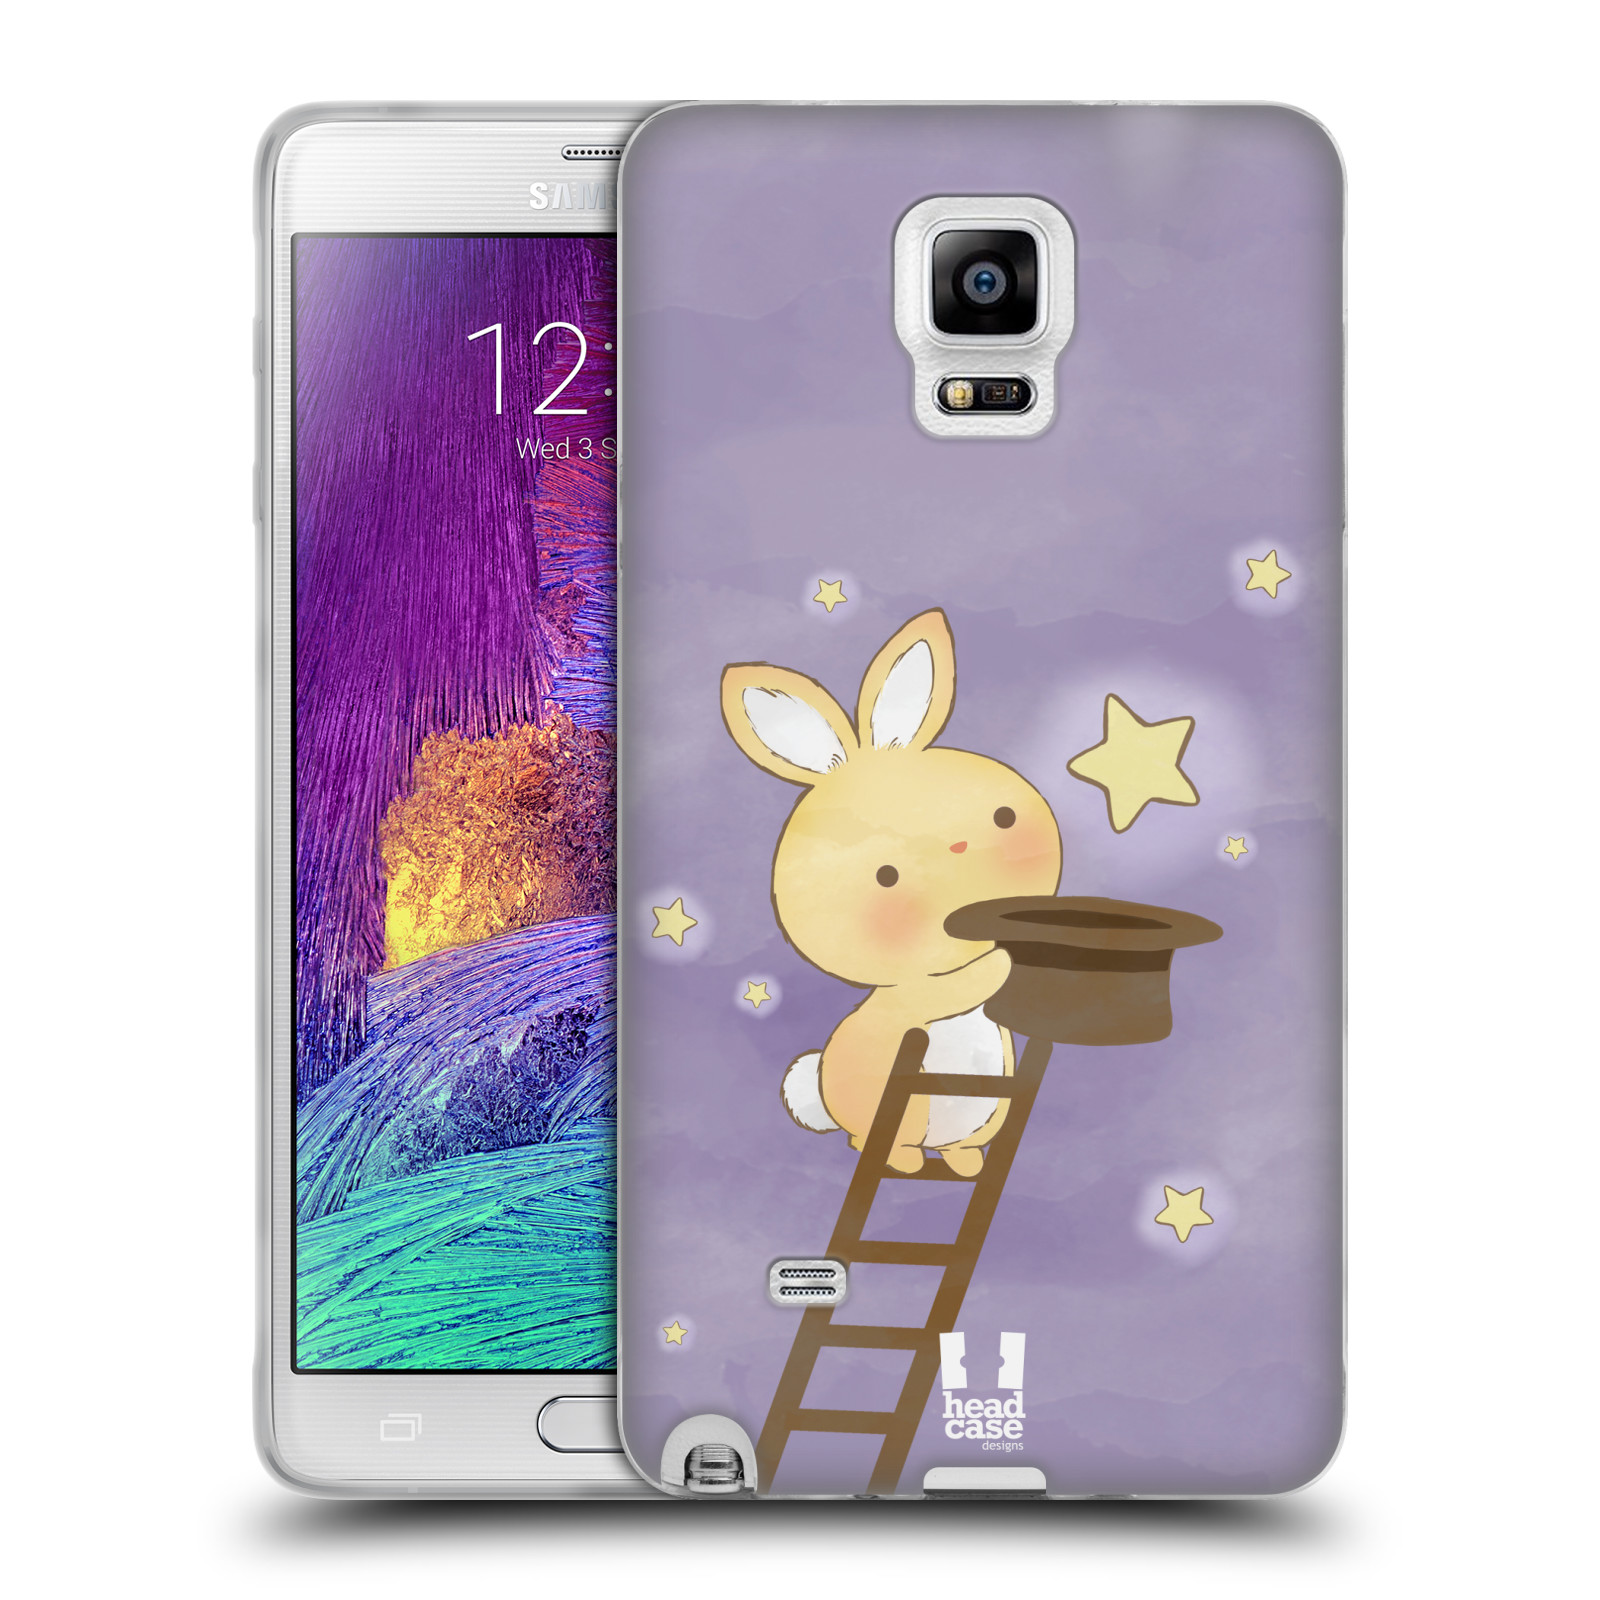 HEAD CASE silikonový obal na mobil Samsung Galaxy Note 4 (N910) vzor králíček a hvězdy fialová